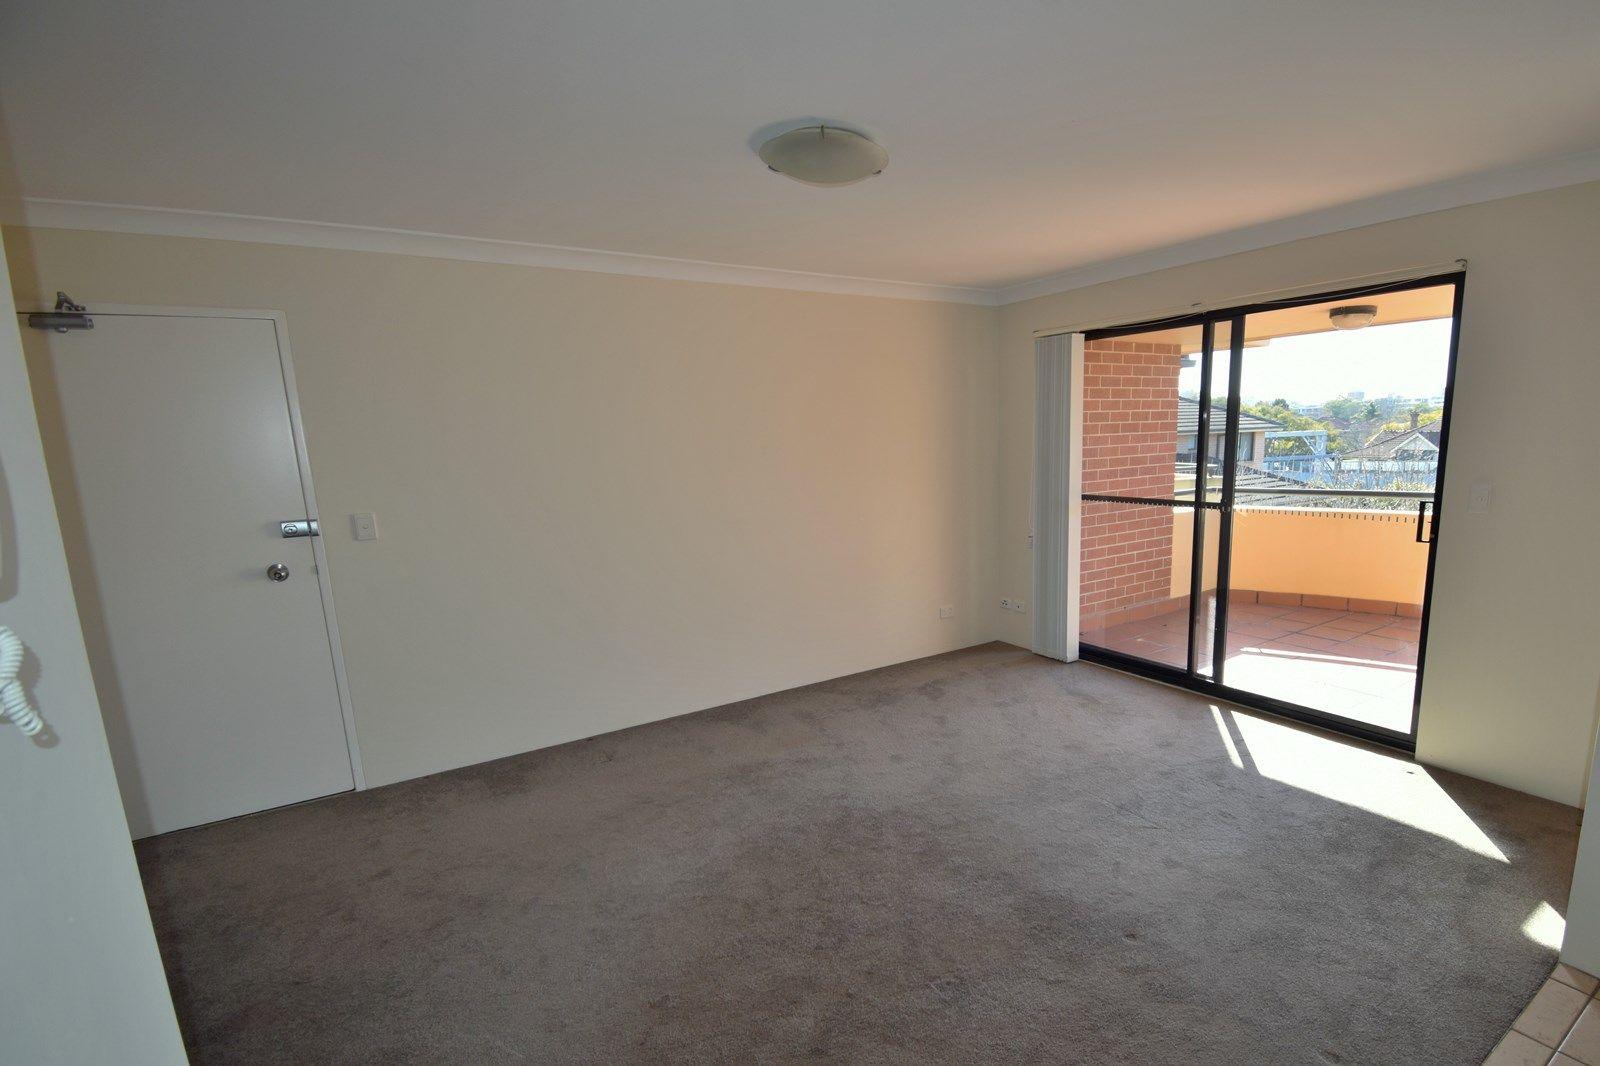 39/9-11 Nelson Street, Chatswood NSW 2067, Image 1